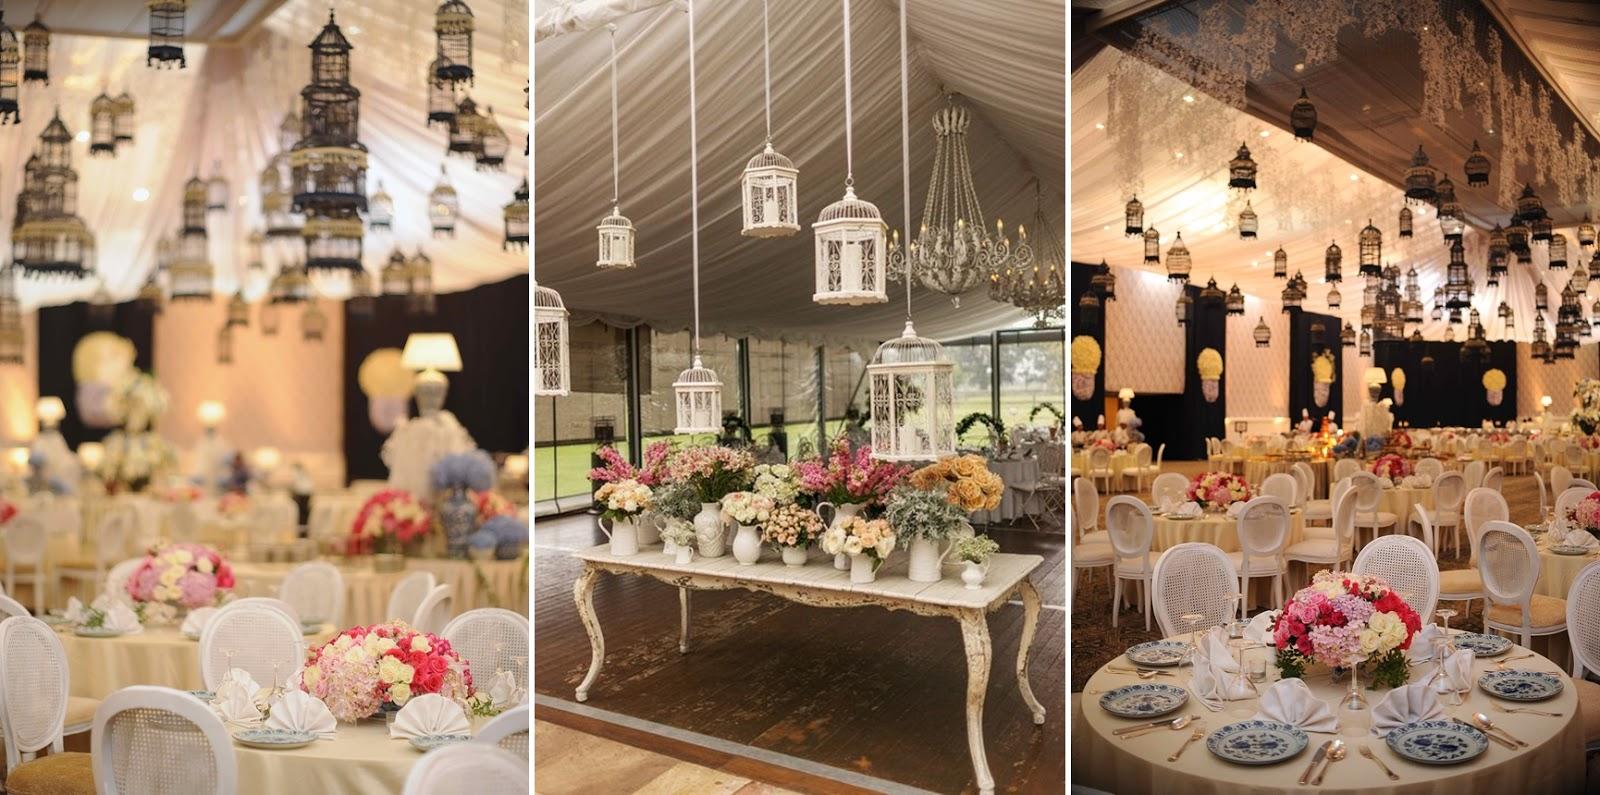 wedding tent decoration - steve's decor